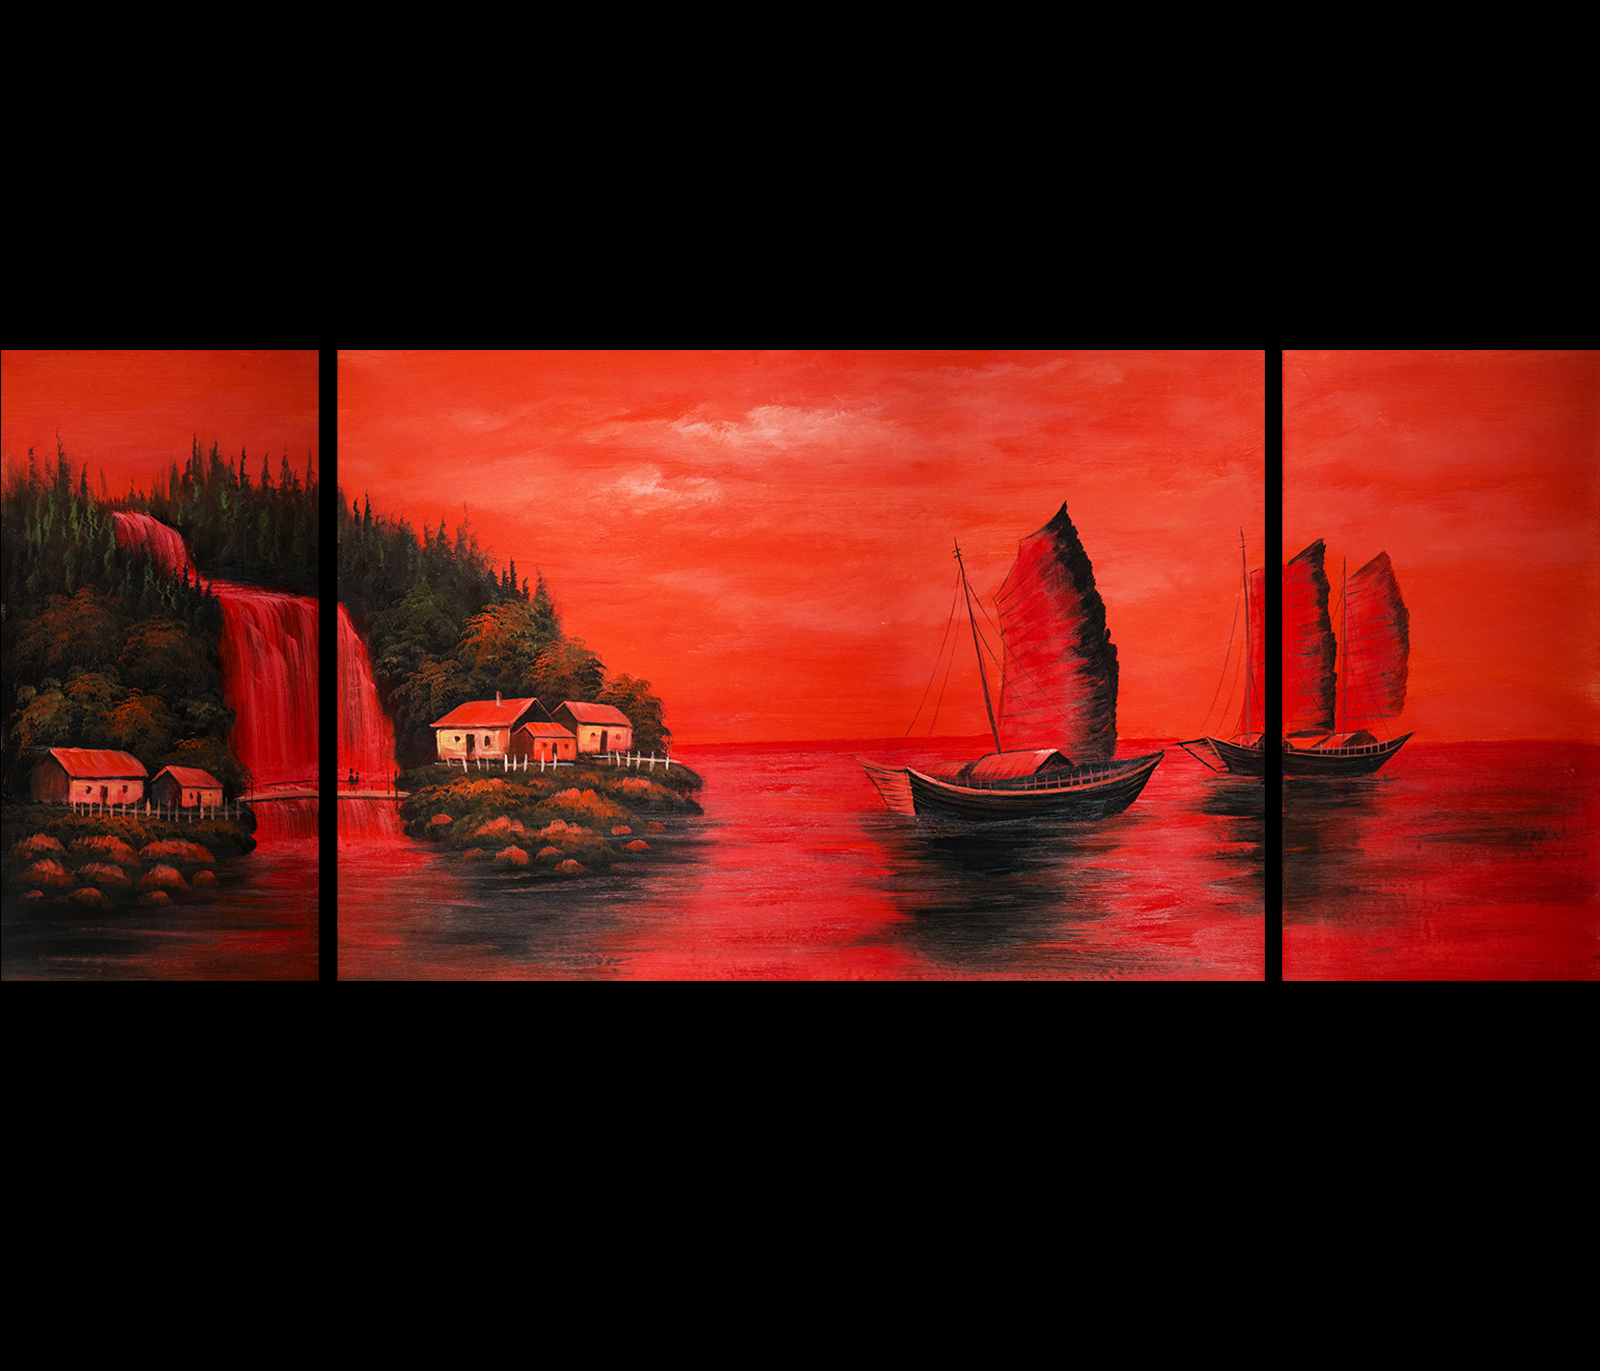 Asian Wall Paintings